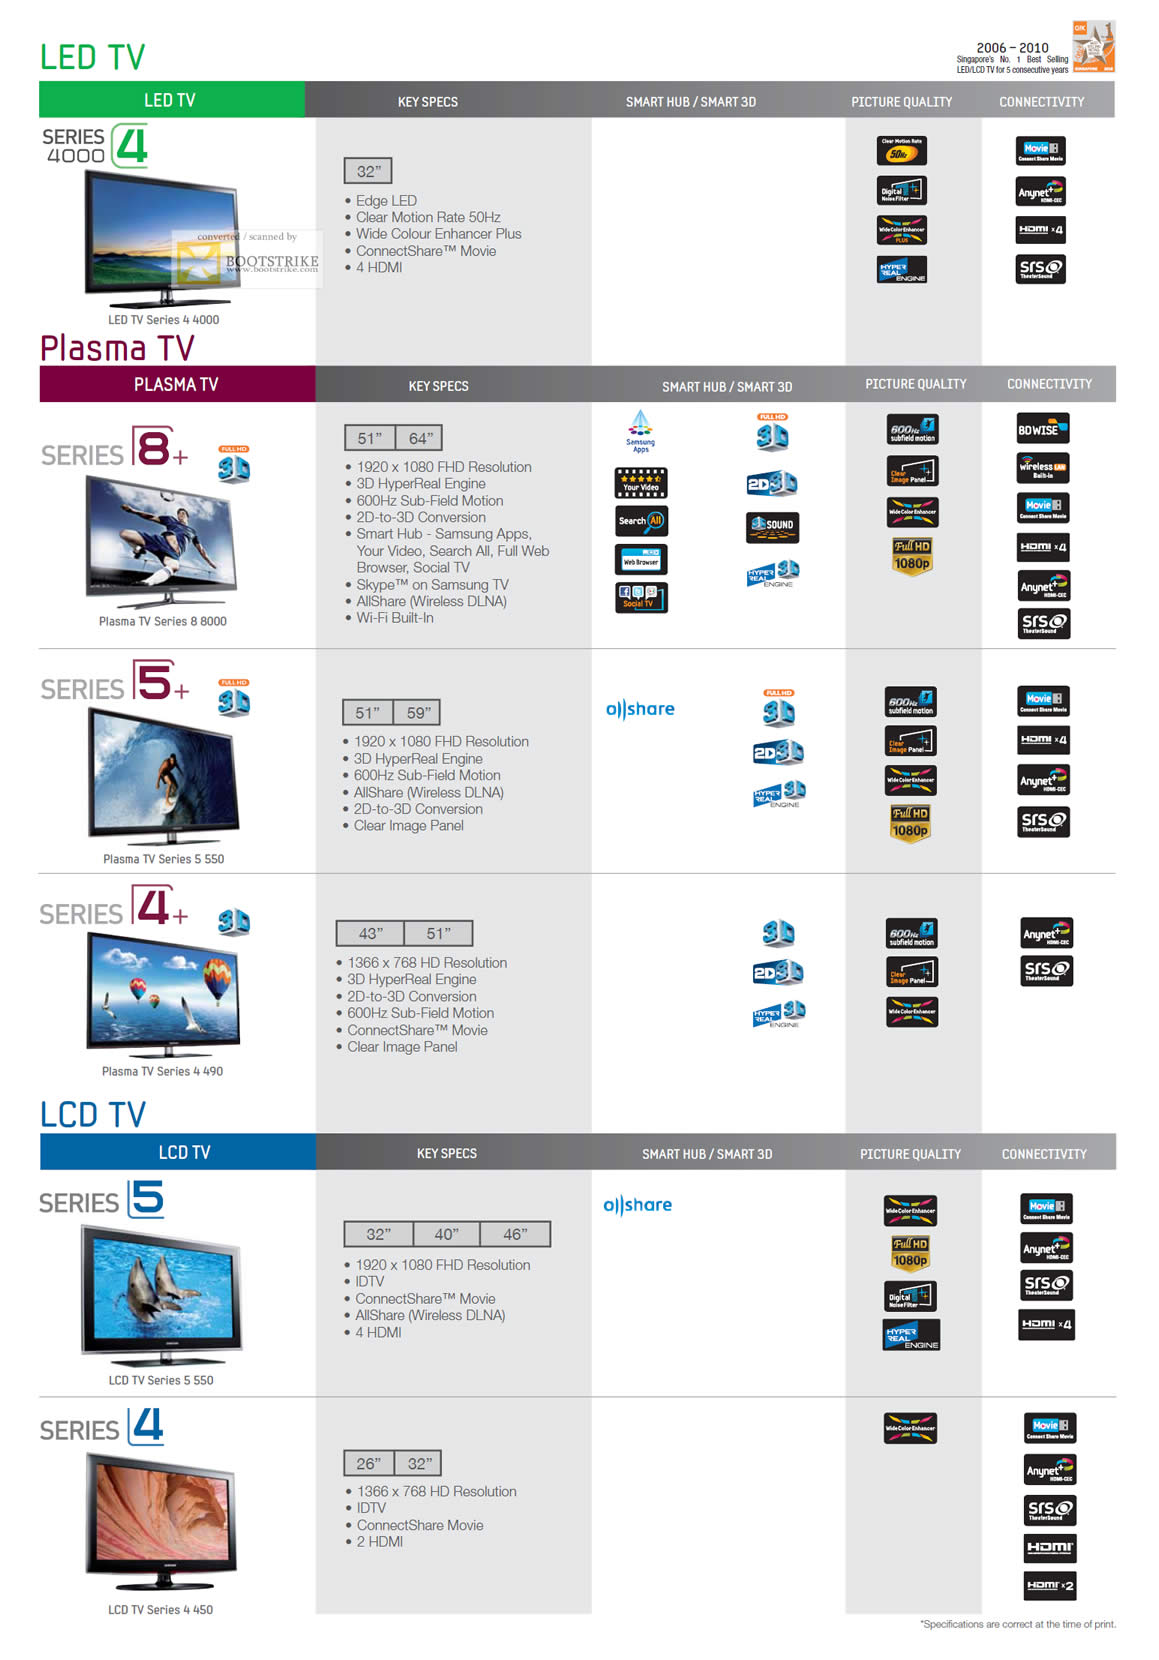 PC Show 2011 price list image brochure of Samsung Courts LED TV Series 4 4000 Plasma TV Series 8 Series 5 Series 4 LCD TV Series 5 Series 4